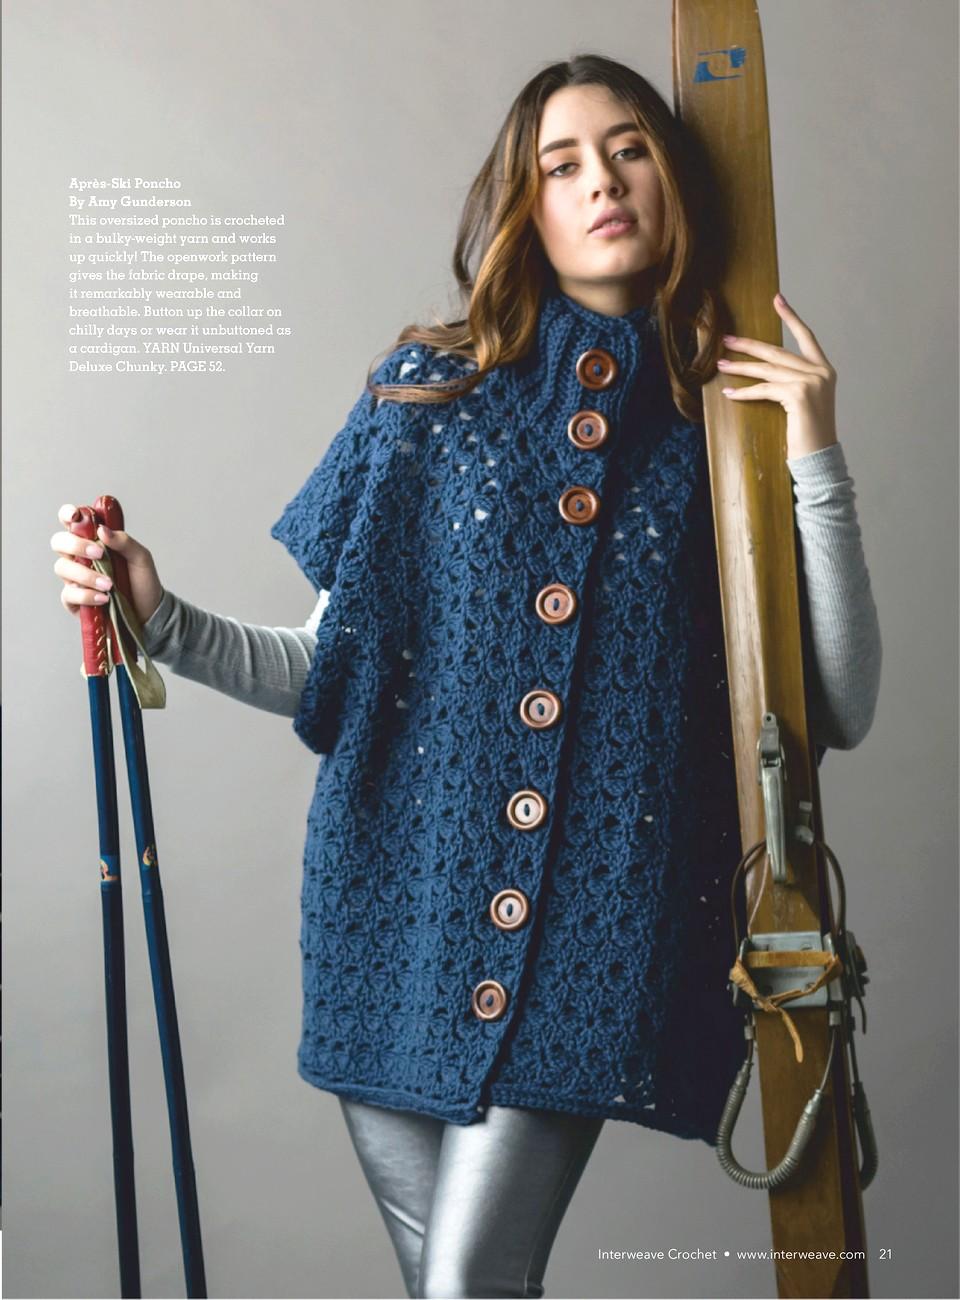 Interweave Crochet Winter 2019-22